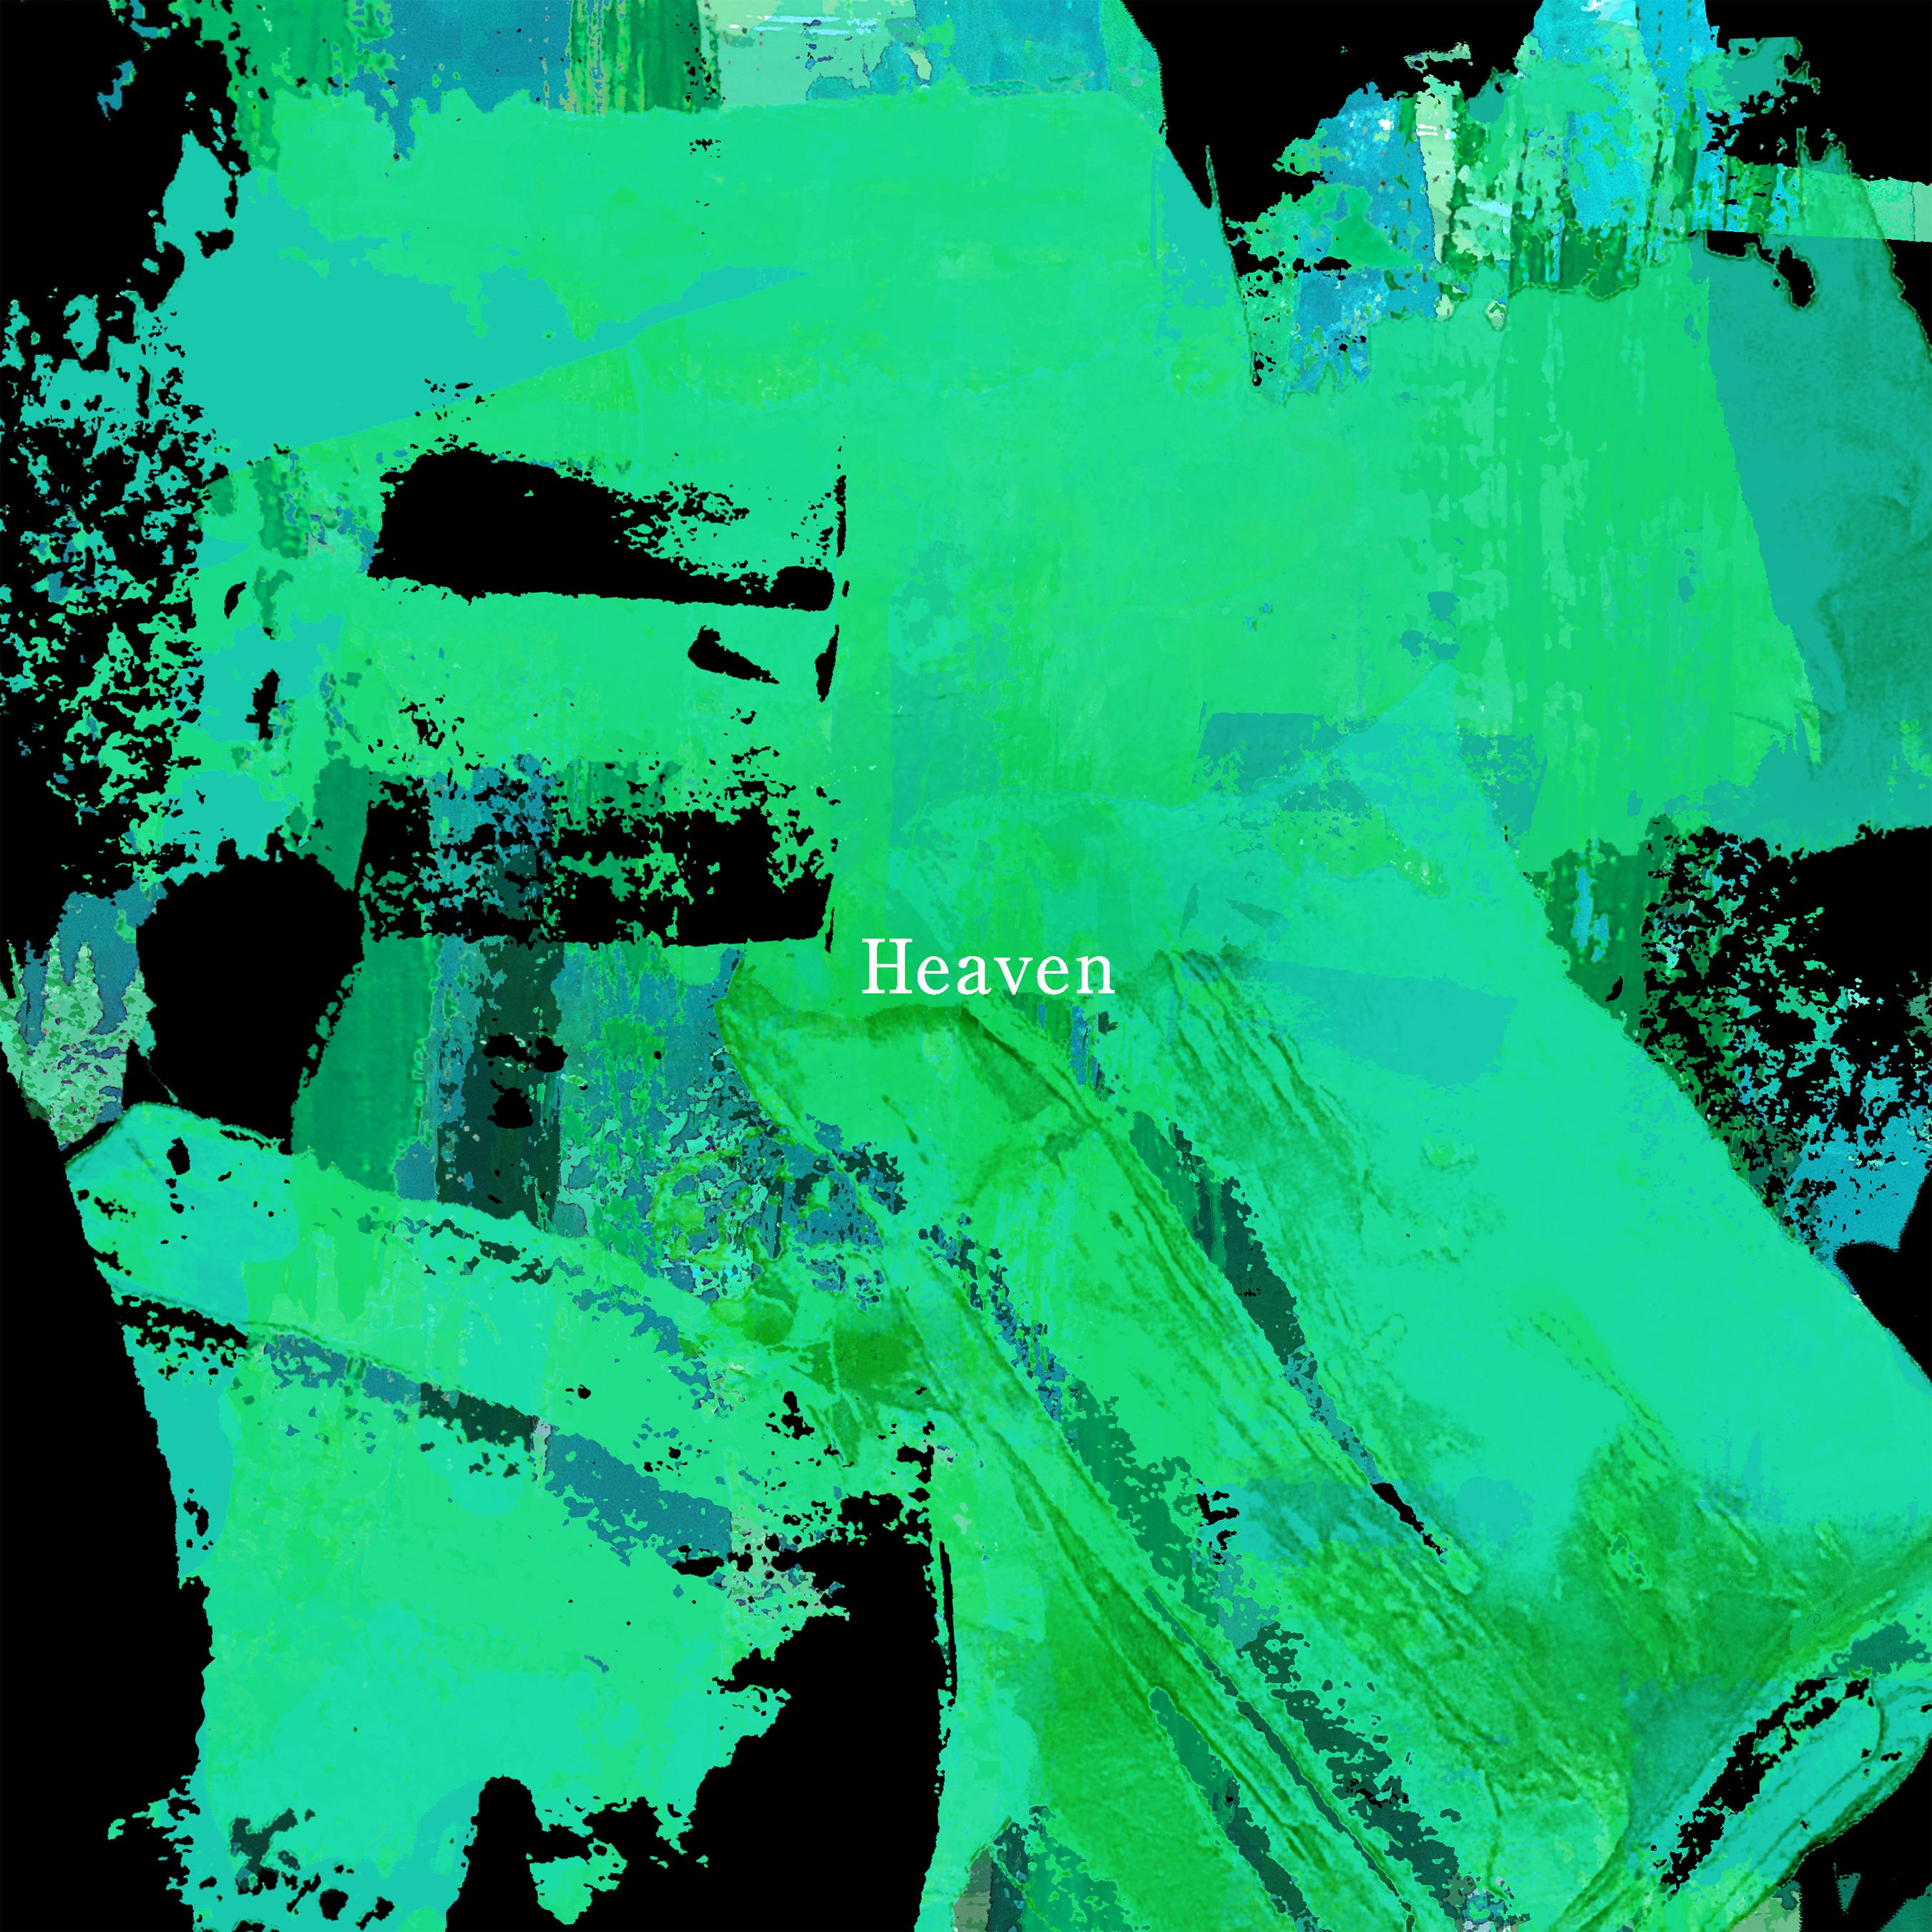 崎山蒼志「Heaven」Jacket